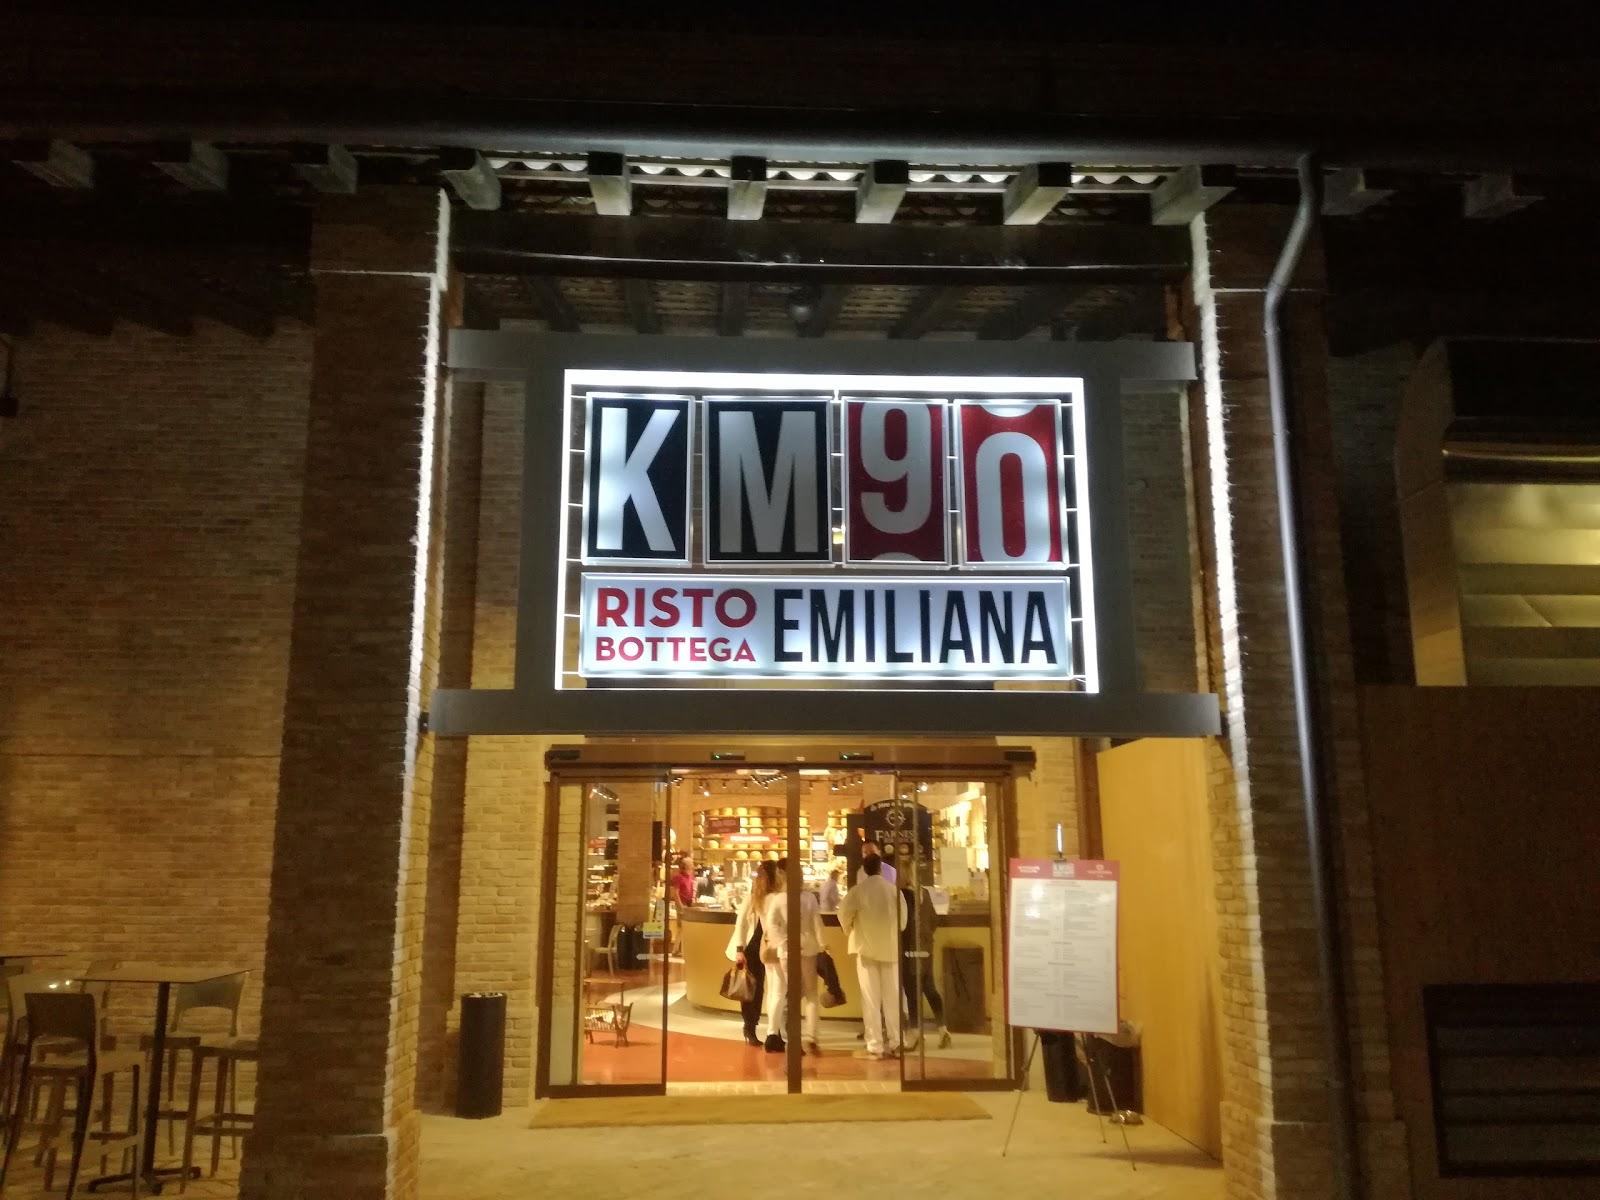 MonnElisa: KM 90....Ristobottega emiliana... Fidenza (Parma)